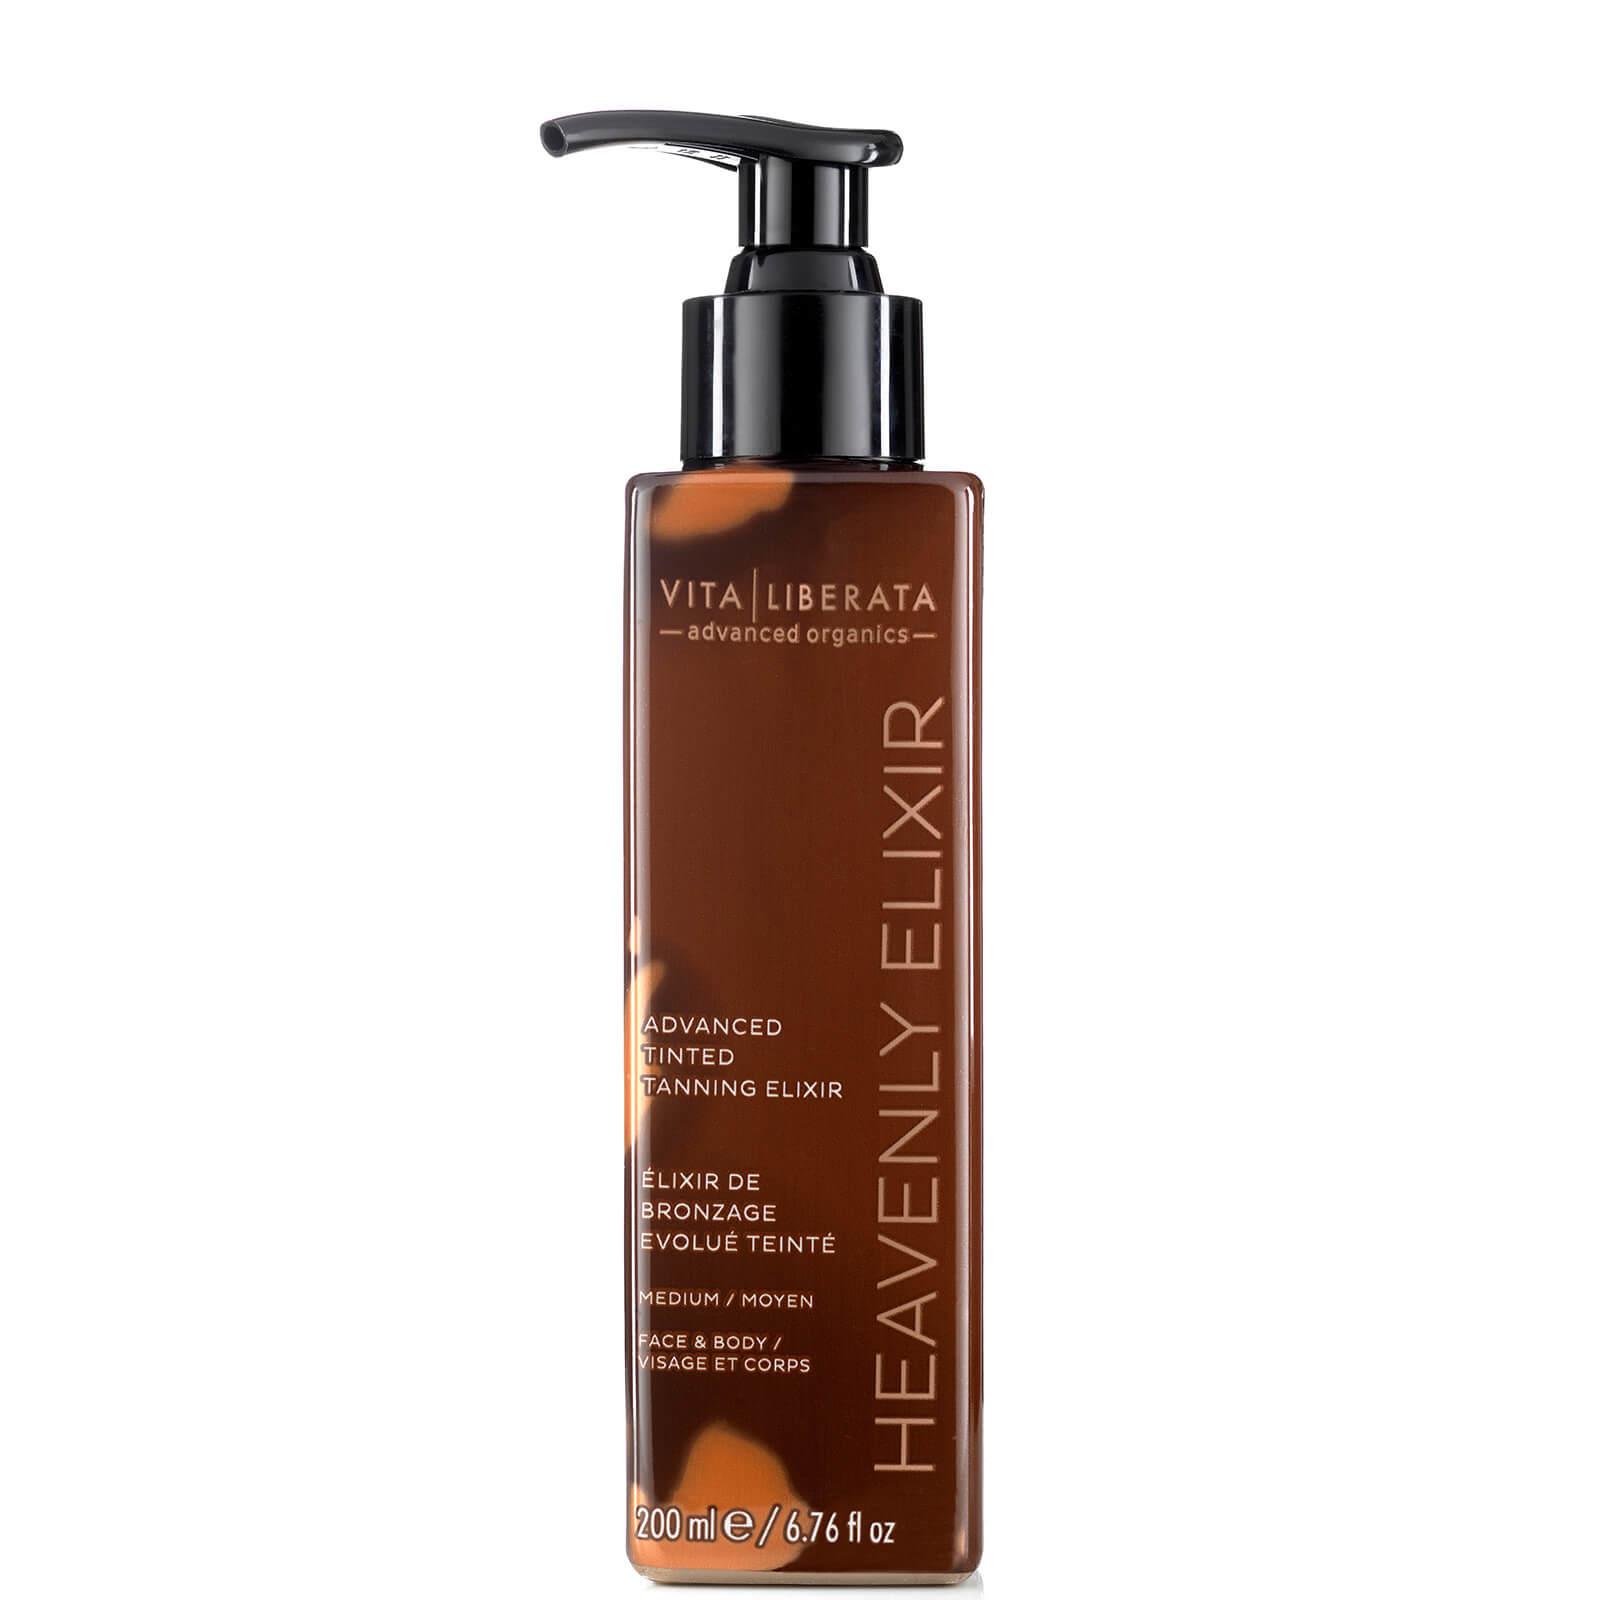 Купить Vita Liberata Heavenly Elixir Advanced Tinted Tanning Elixir 200ml